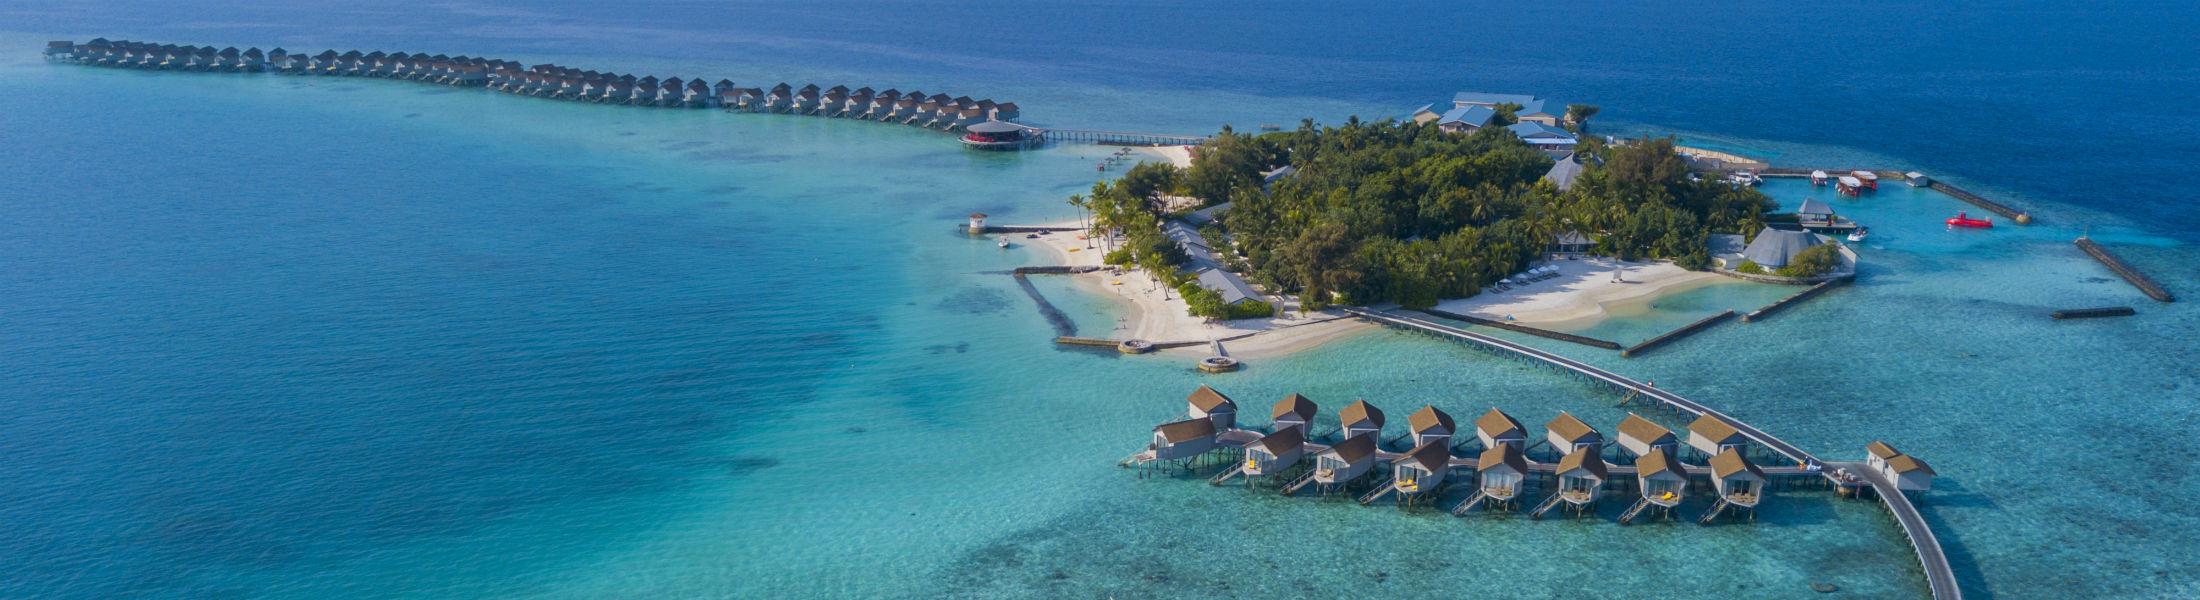 Maldives hotel island